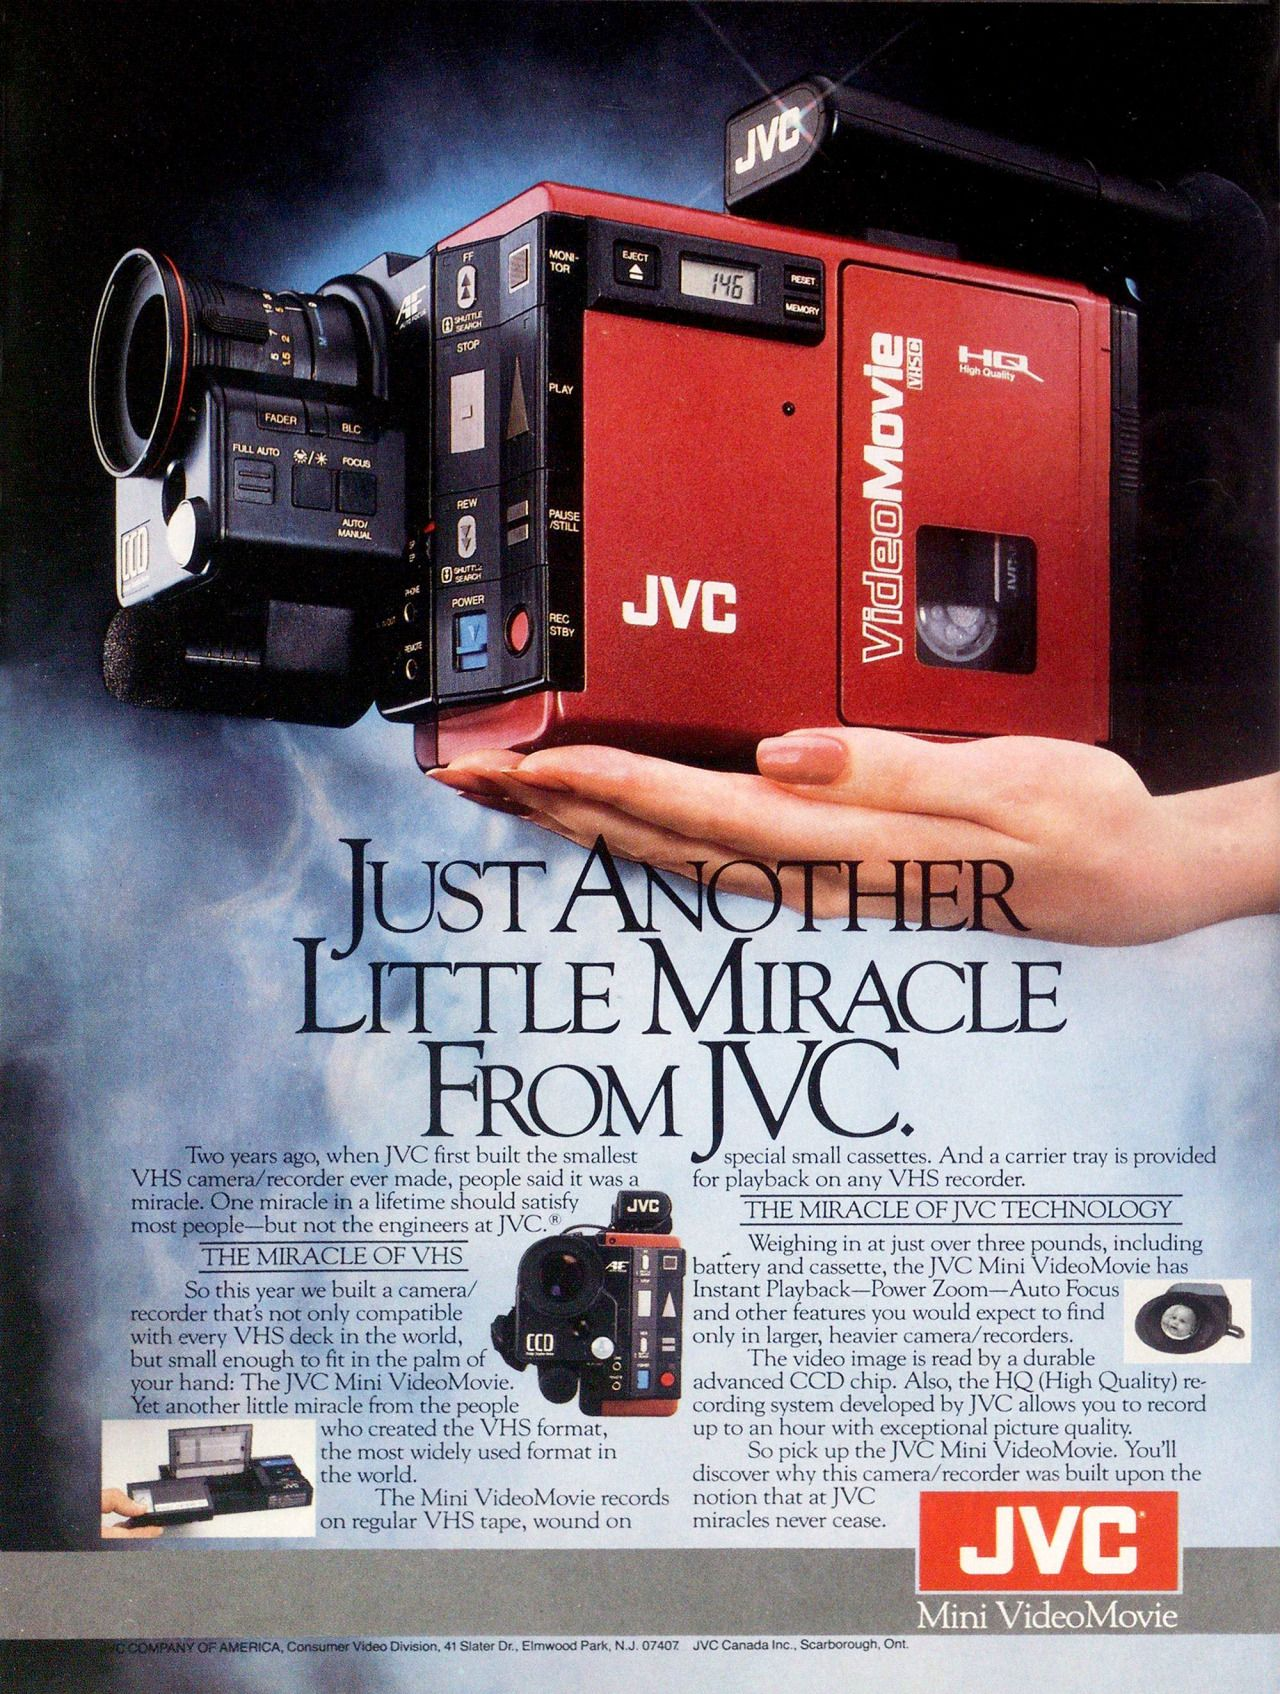 Jvc Mini Videomovie Camcorder Print Advertisement  1986